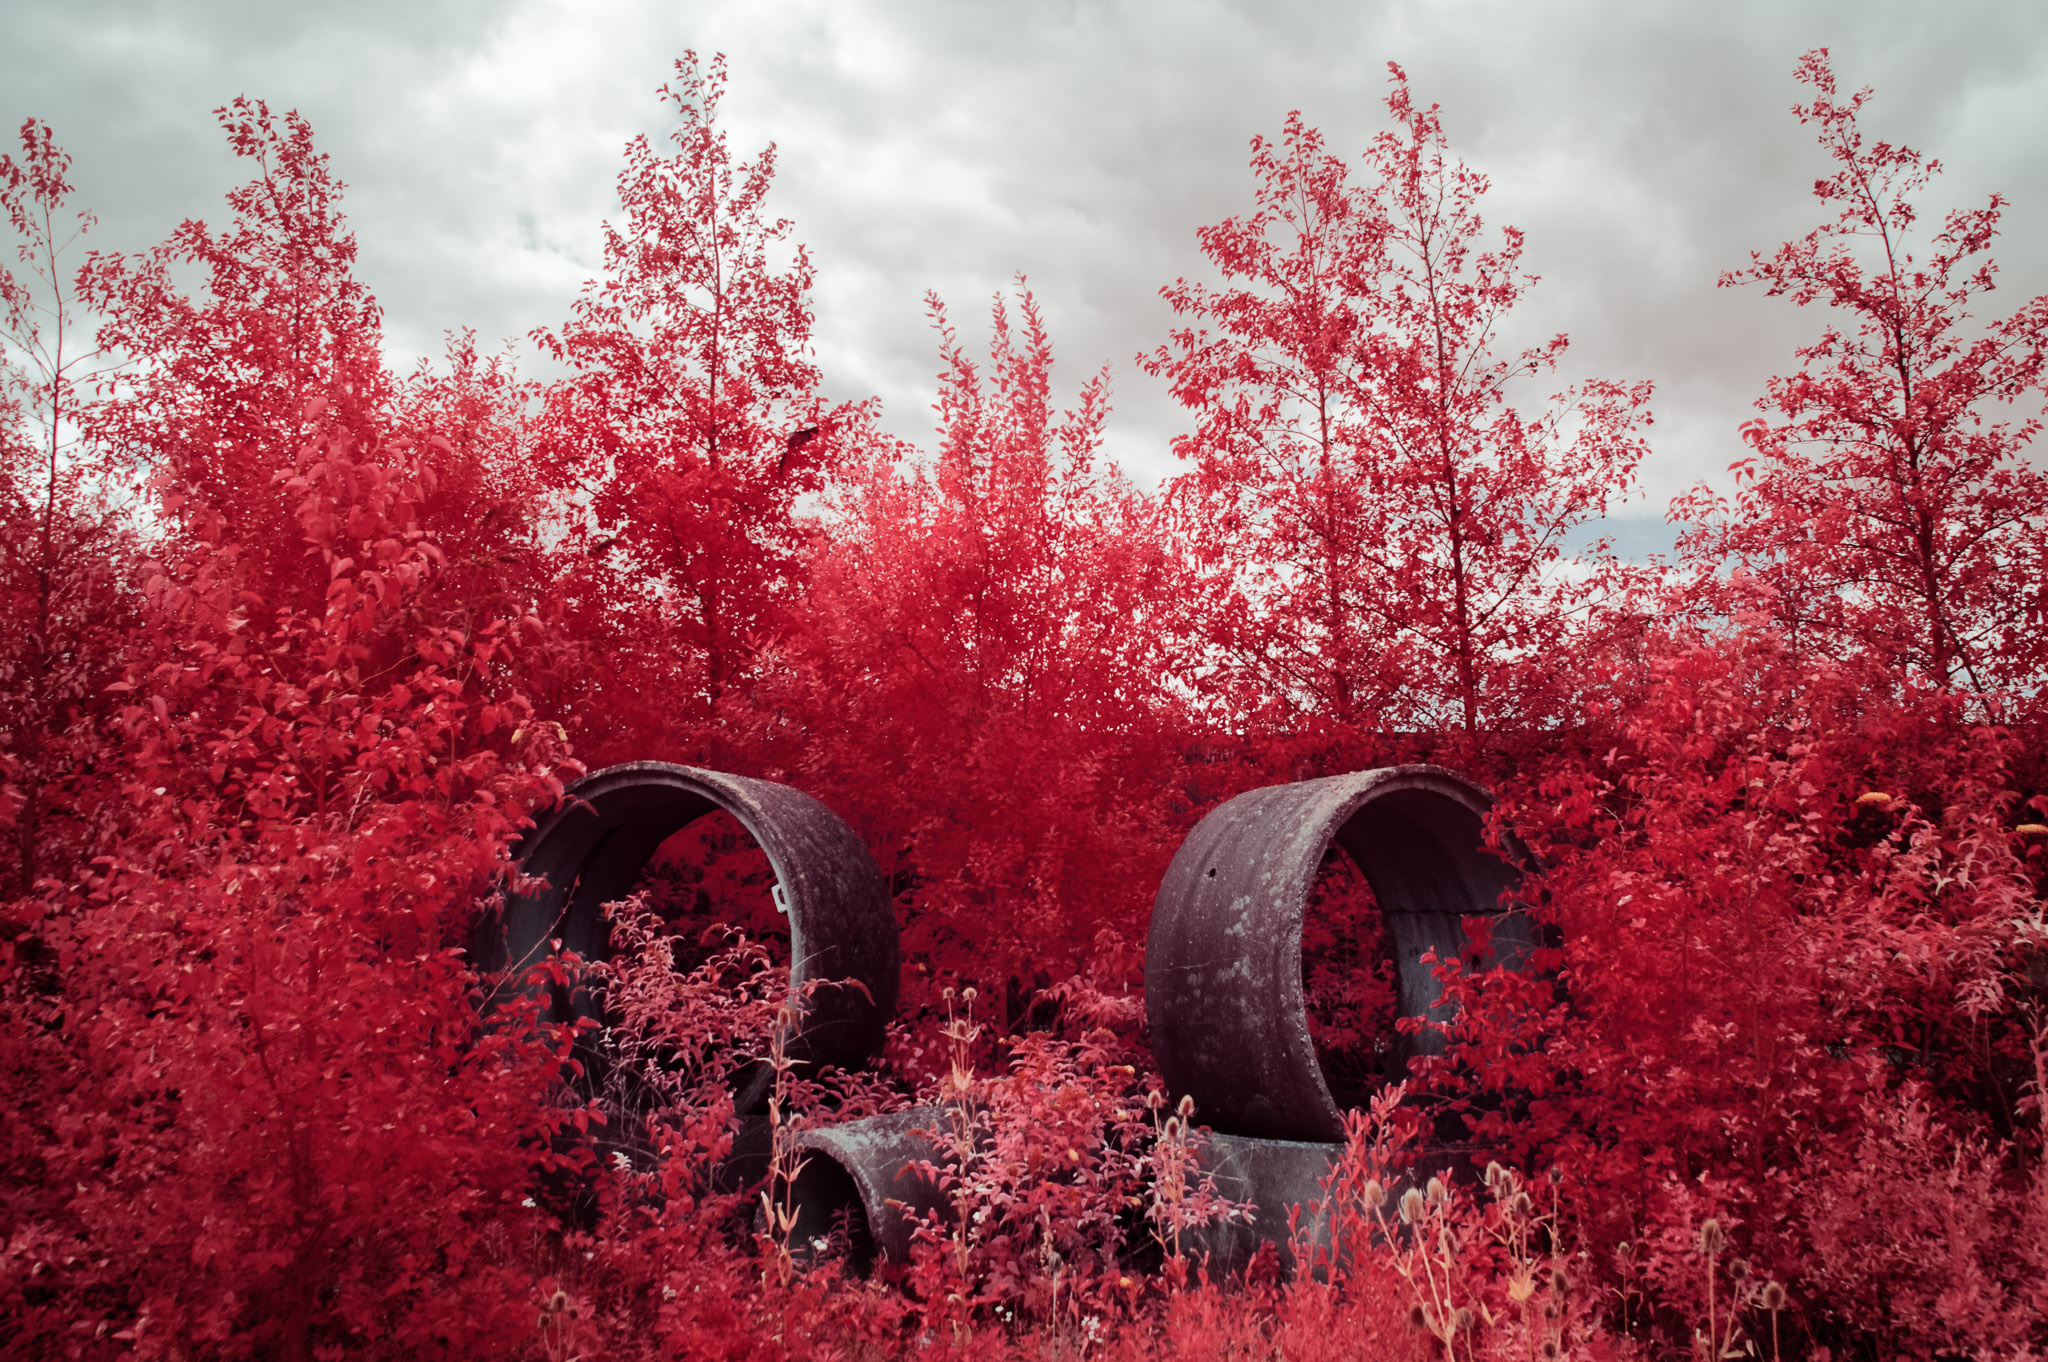 Kodak EIR Colour Infrared, Edgelands, Wasteland, Sewer Pipe ©Jonny Sutton